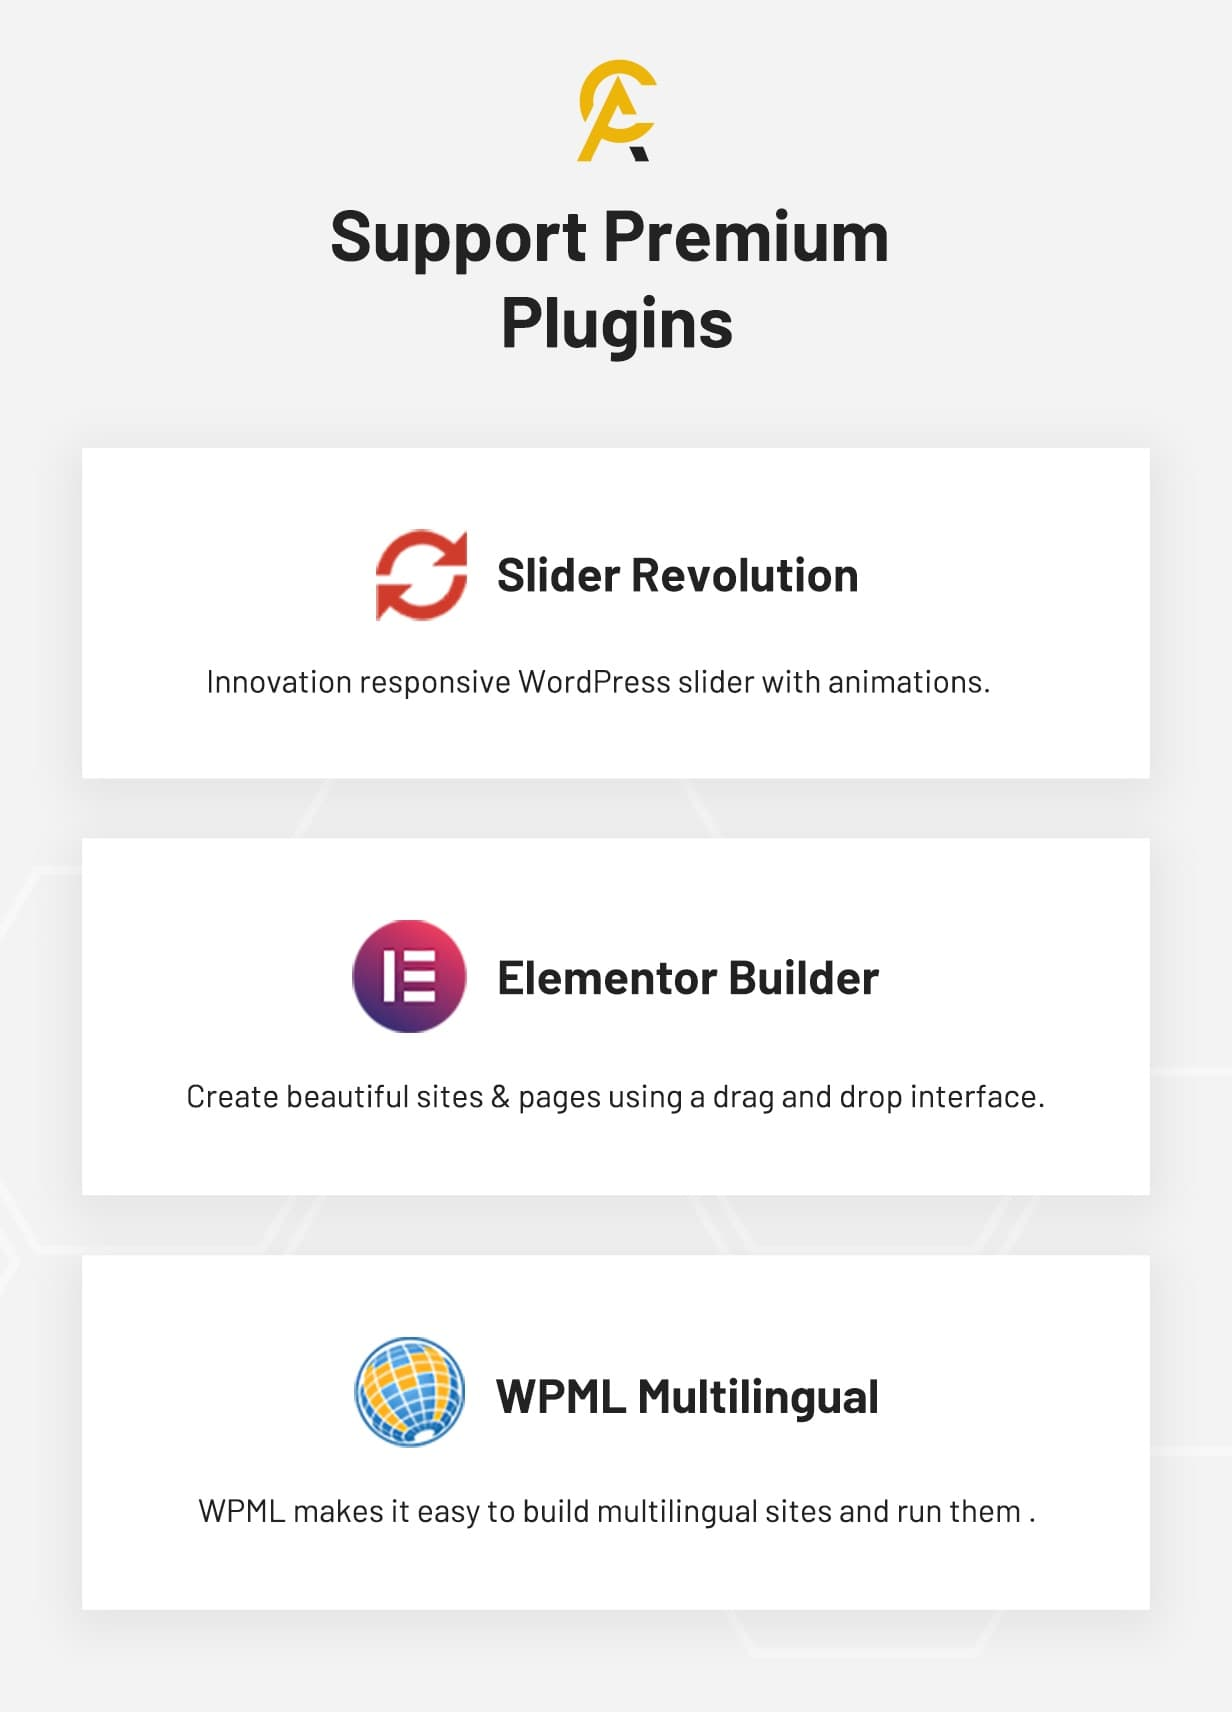 Antek - Support Premium Plugins